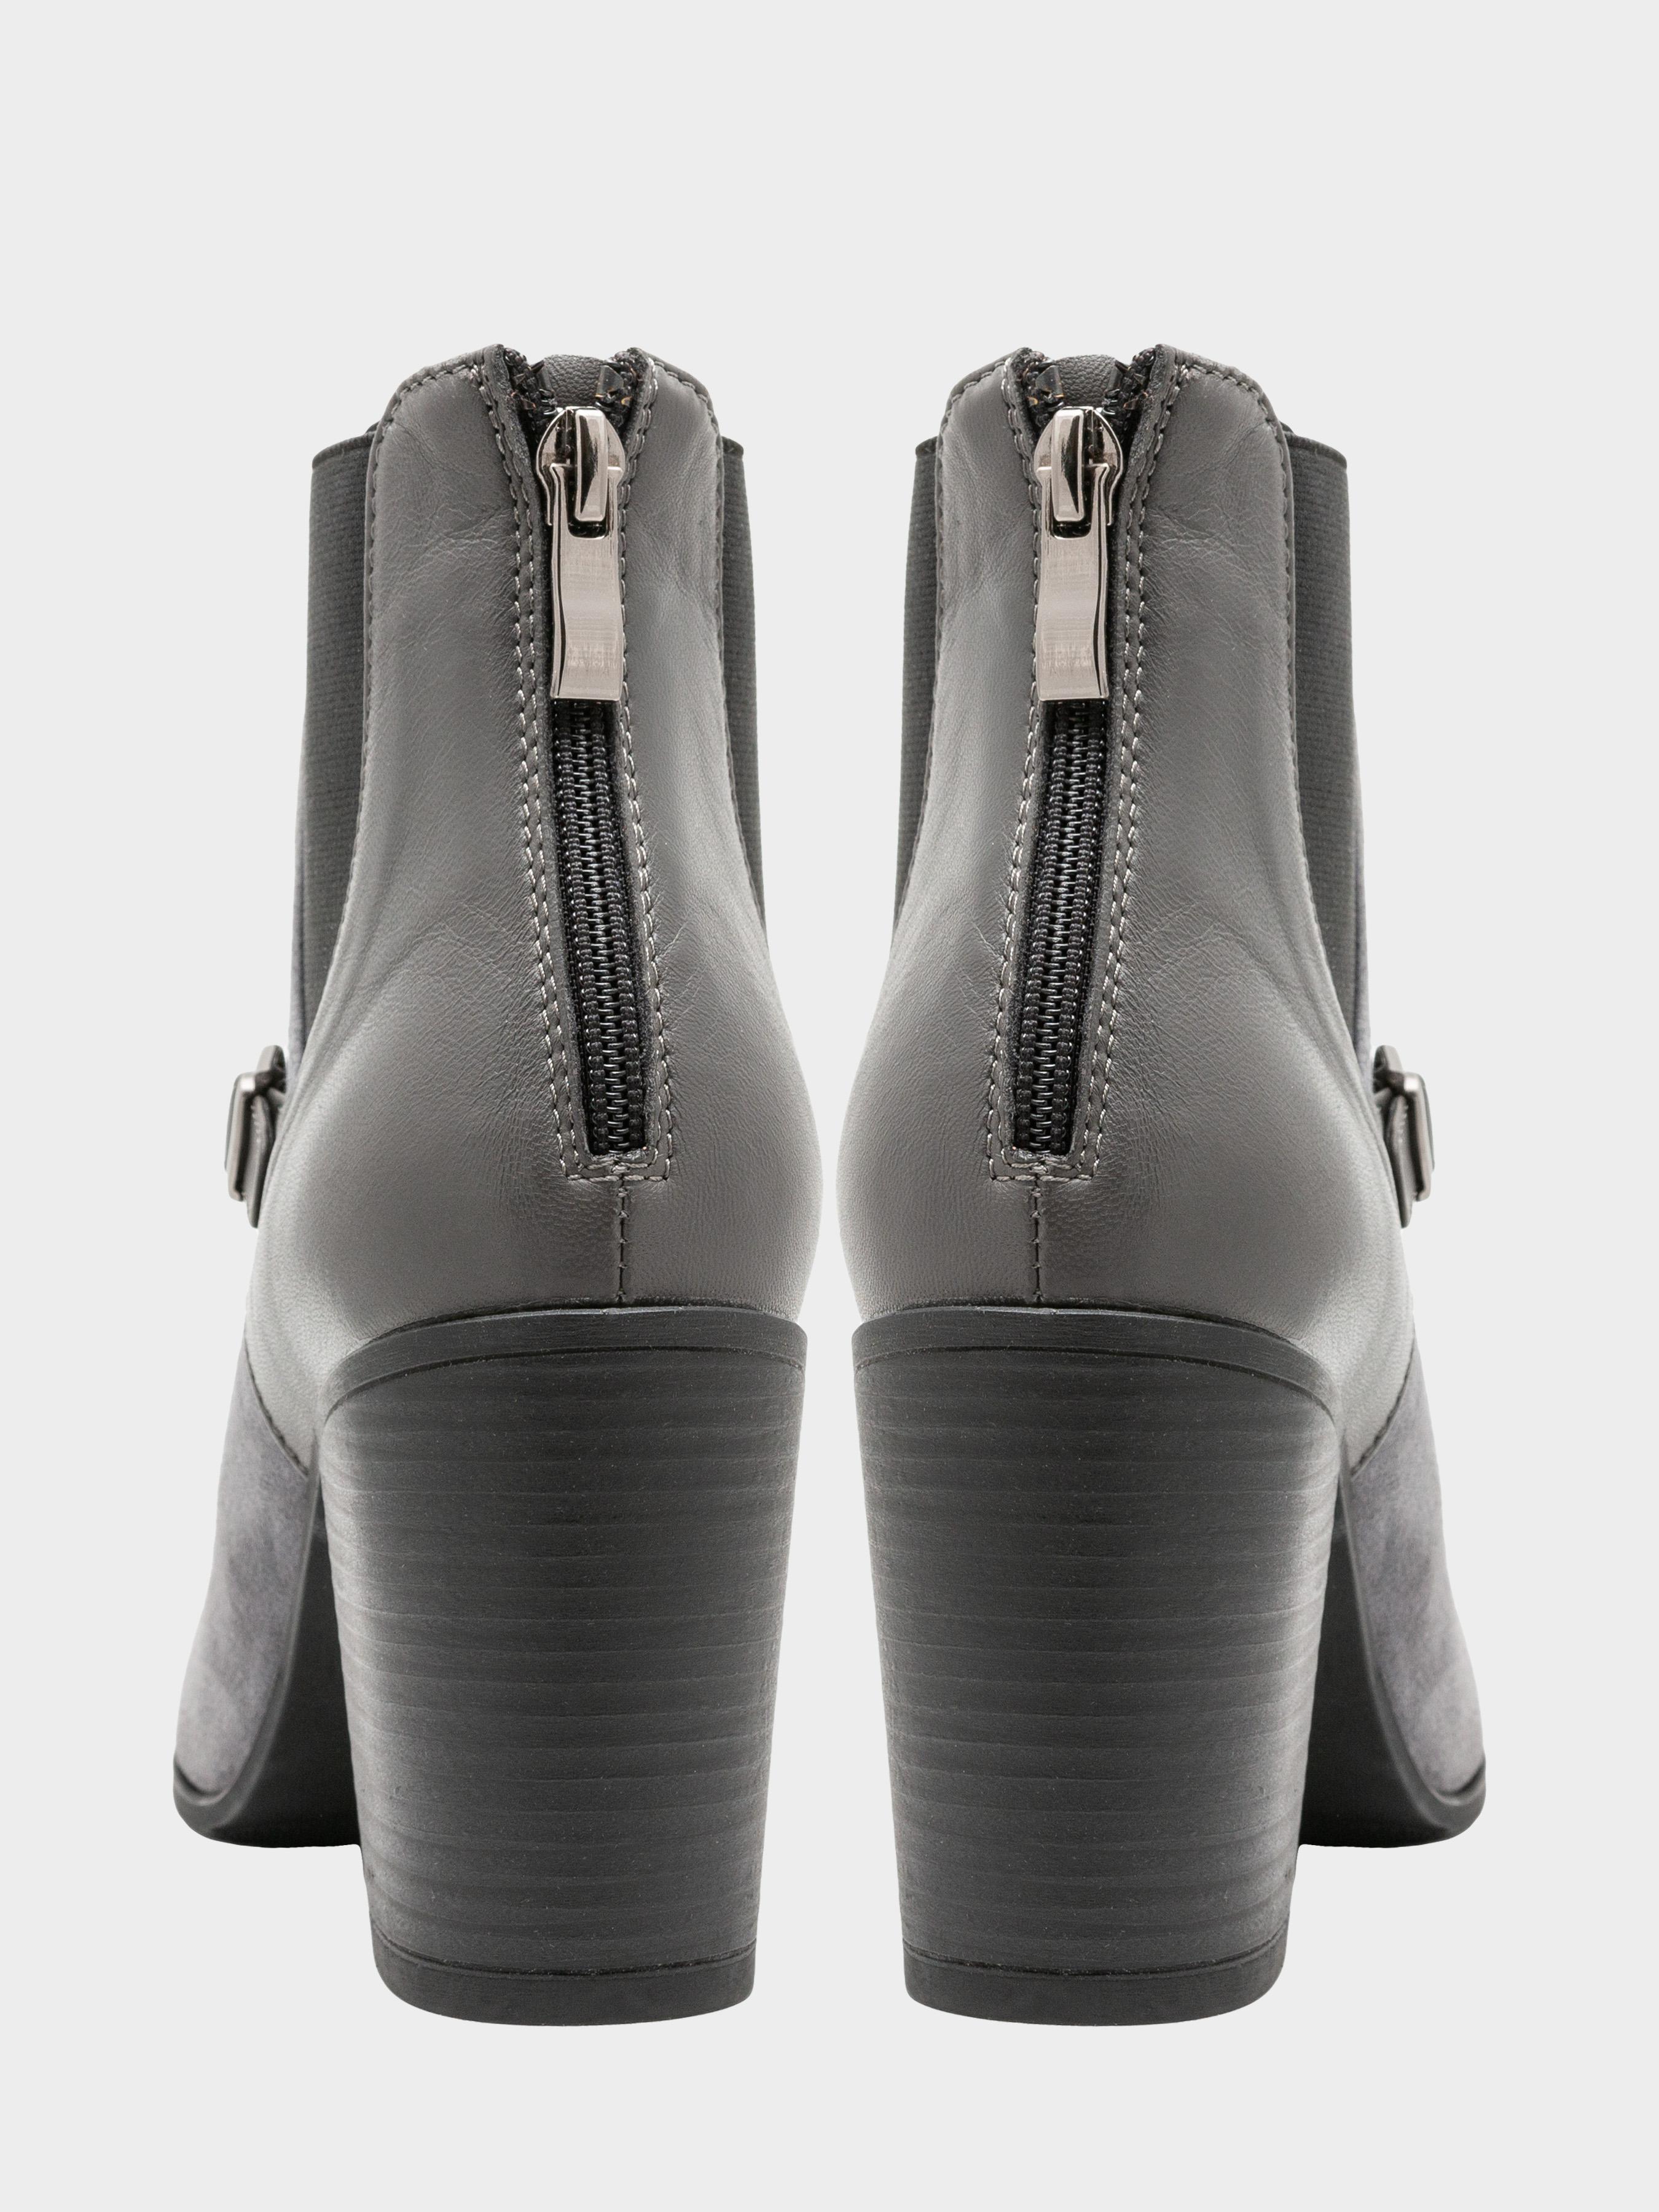 Ботинки для женщин Ботинки женские ENZO VERRATTI 18-9695-2gr примерка, 2017